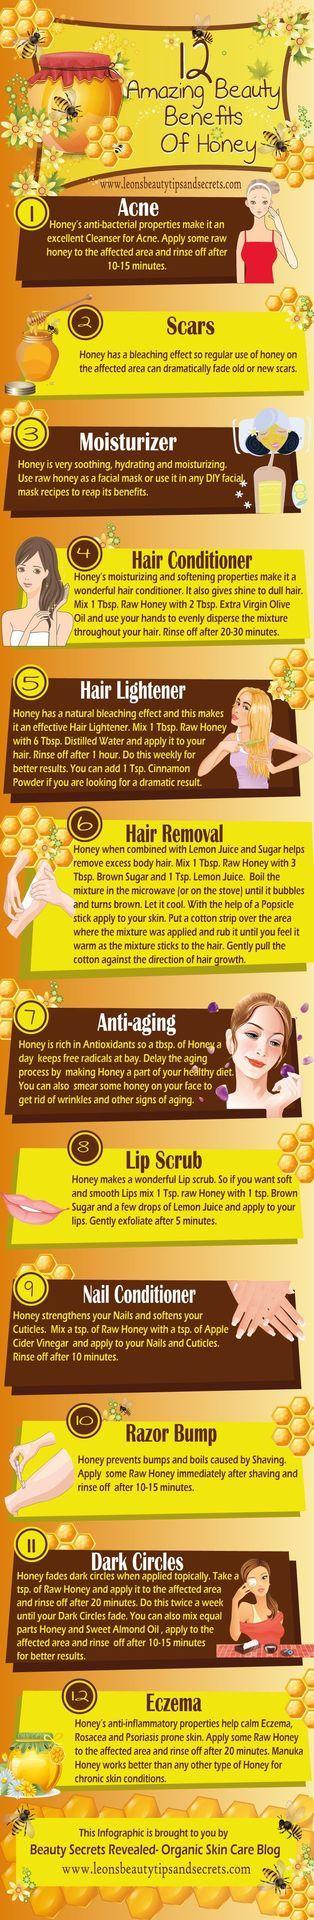 12 Amazing Beauty Benefits Of Honey